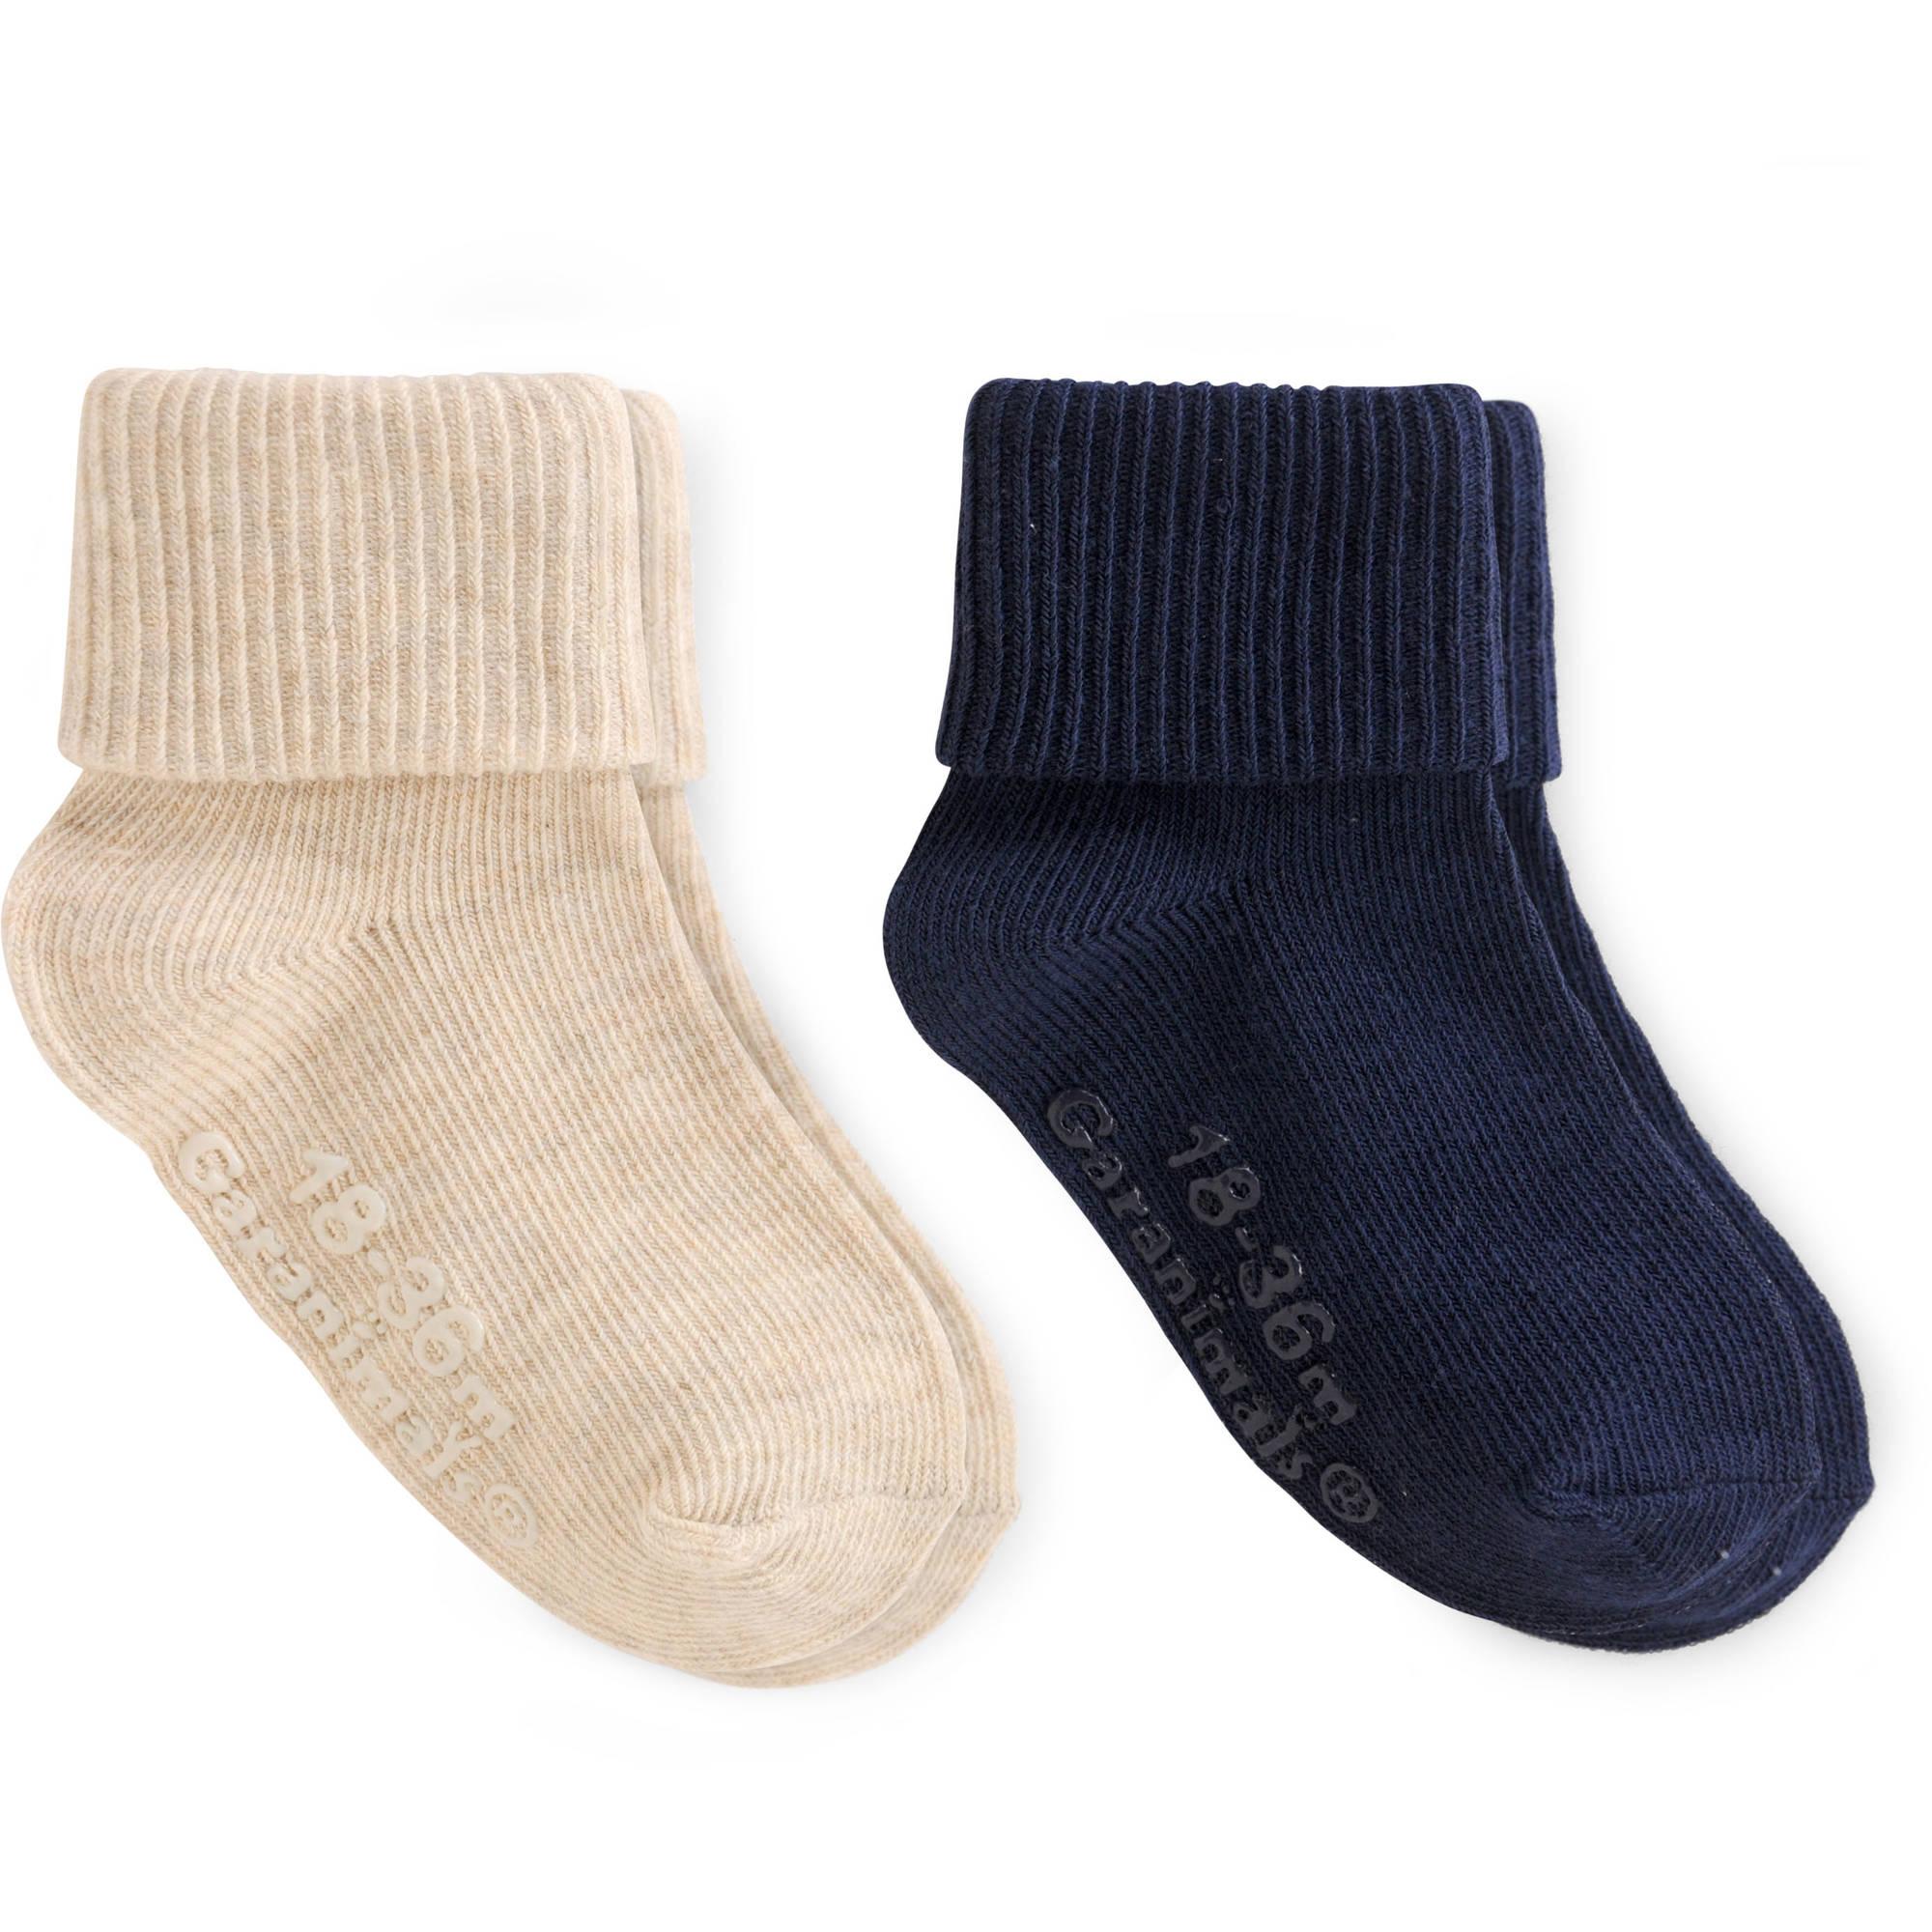 Garanimals Baby Toddler Boy Navy Khaki Gripper Socks Ages NB-5T, 2-Pack